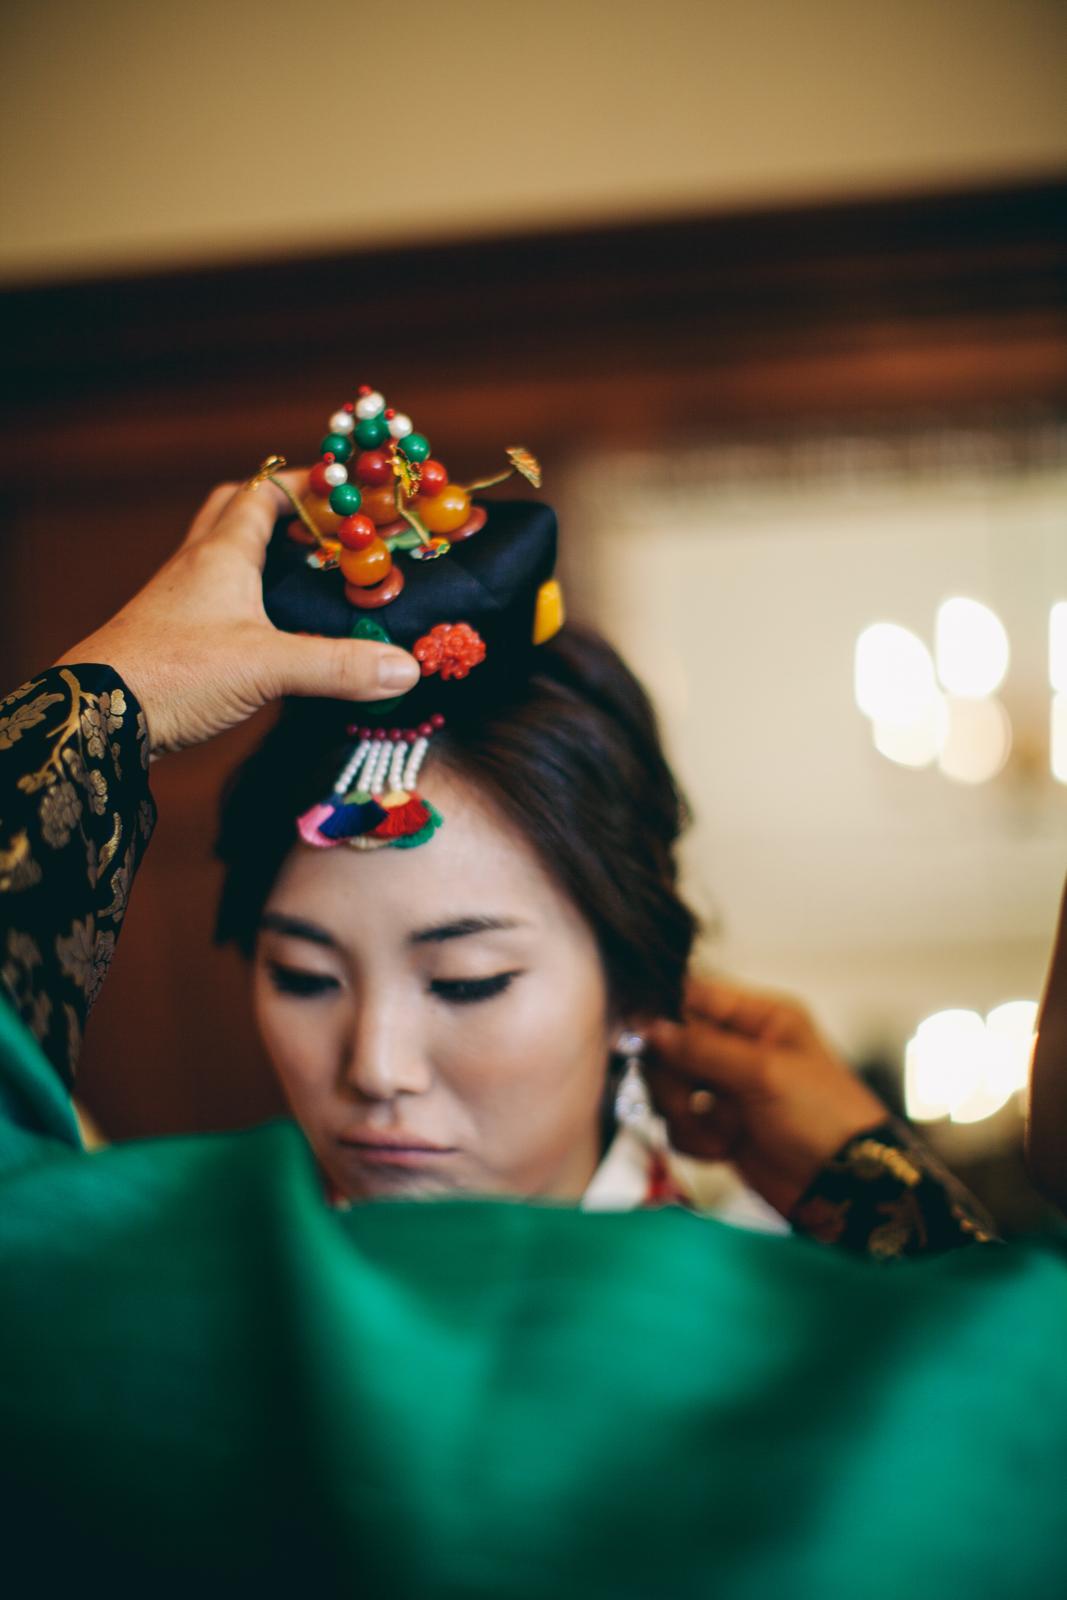 kohl_manison_wedding_photography_sarah_eric_ebony_siovhan_bokeh_photography_050.jpg